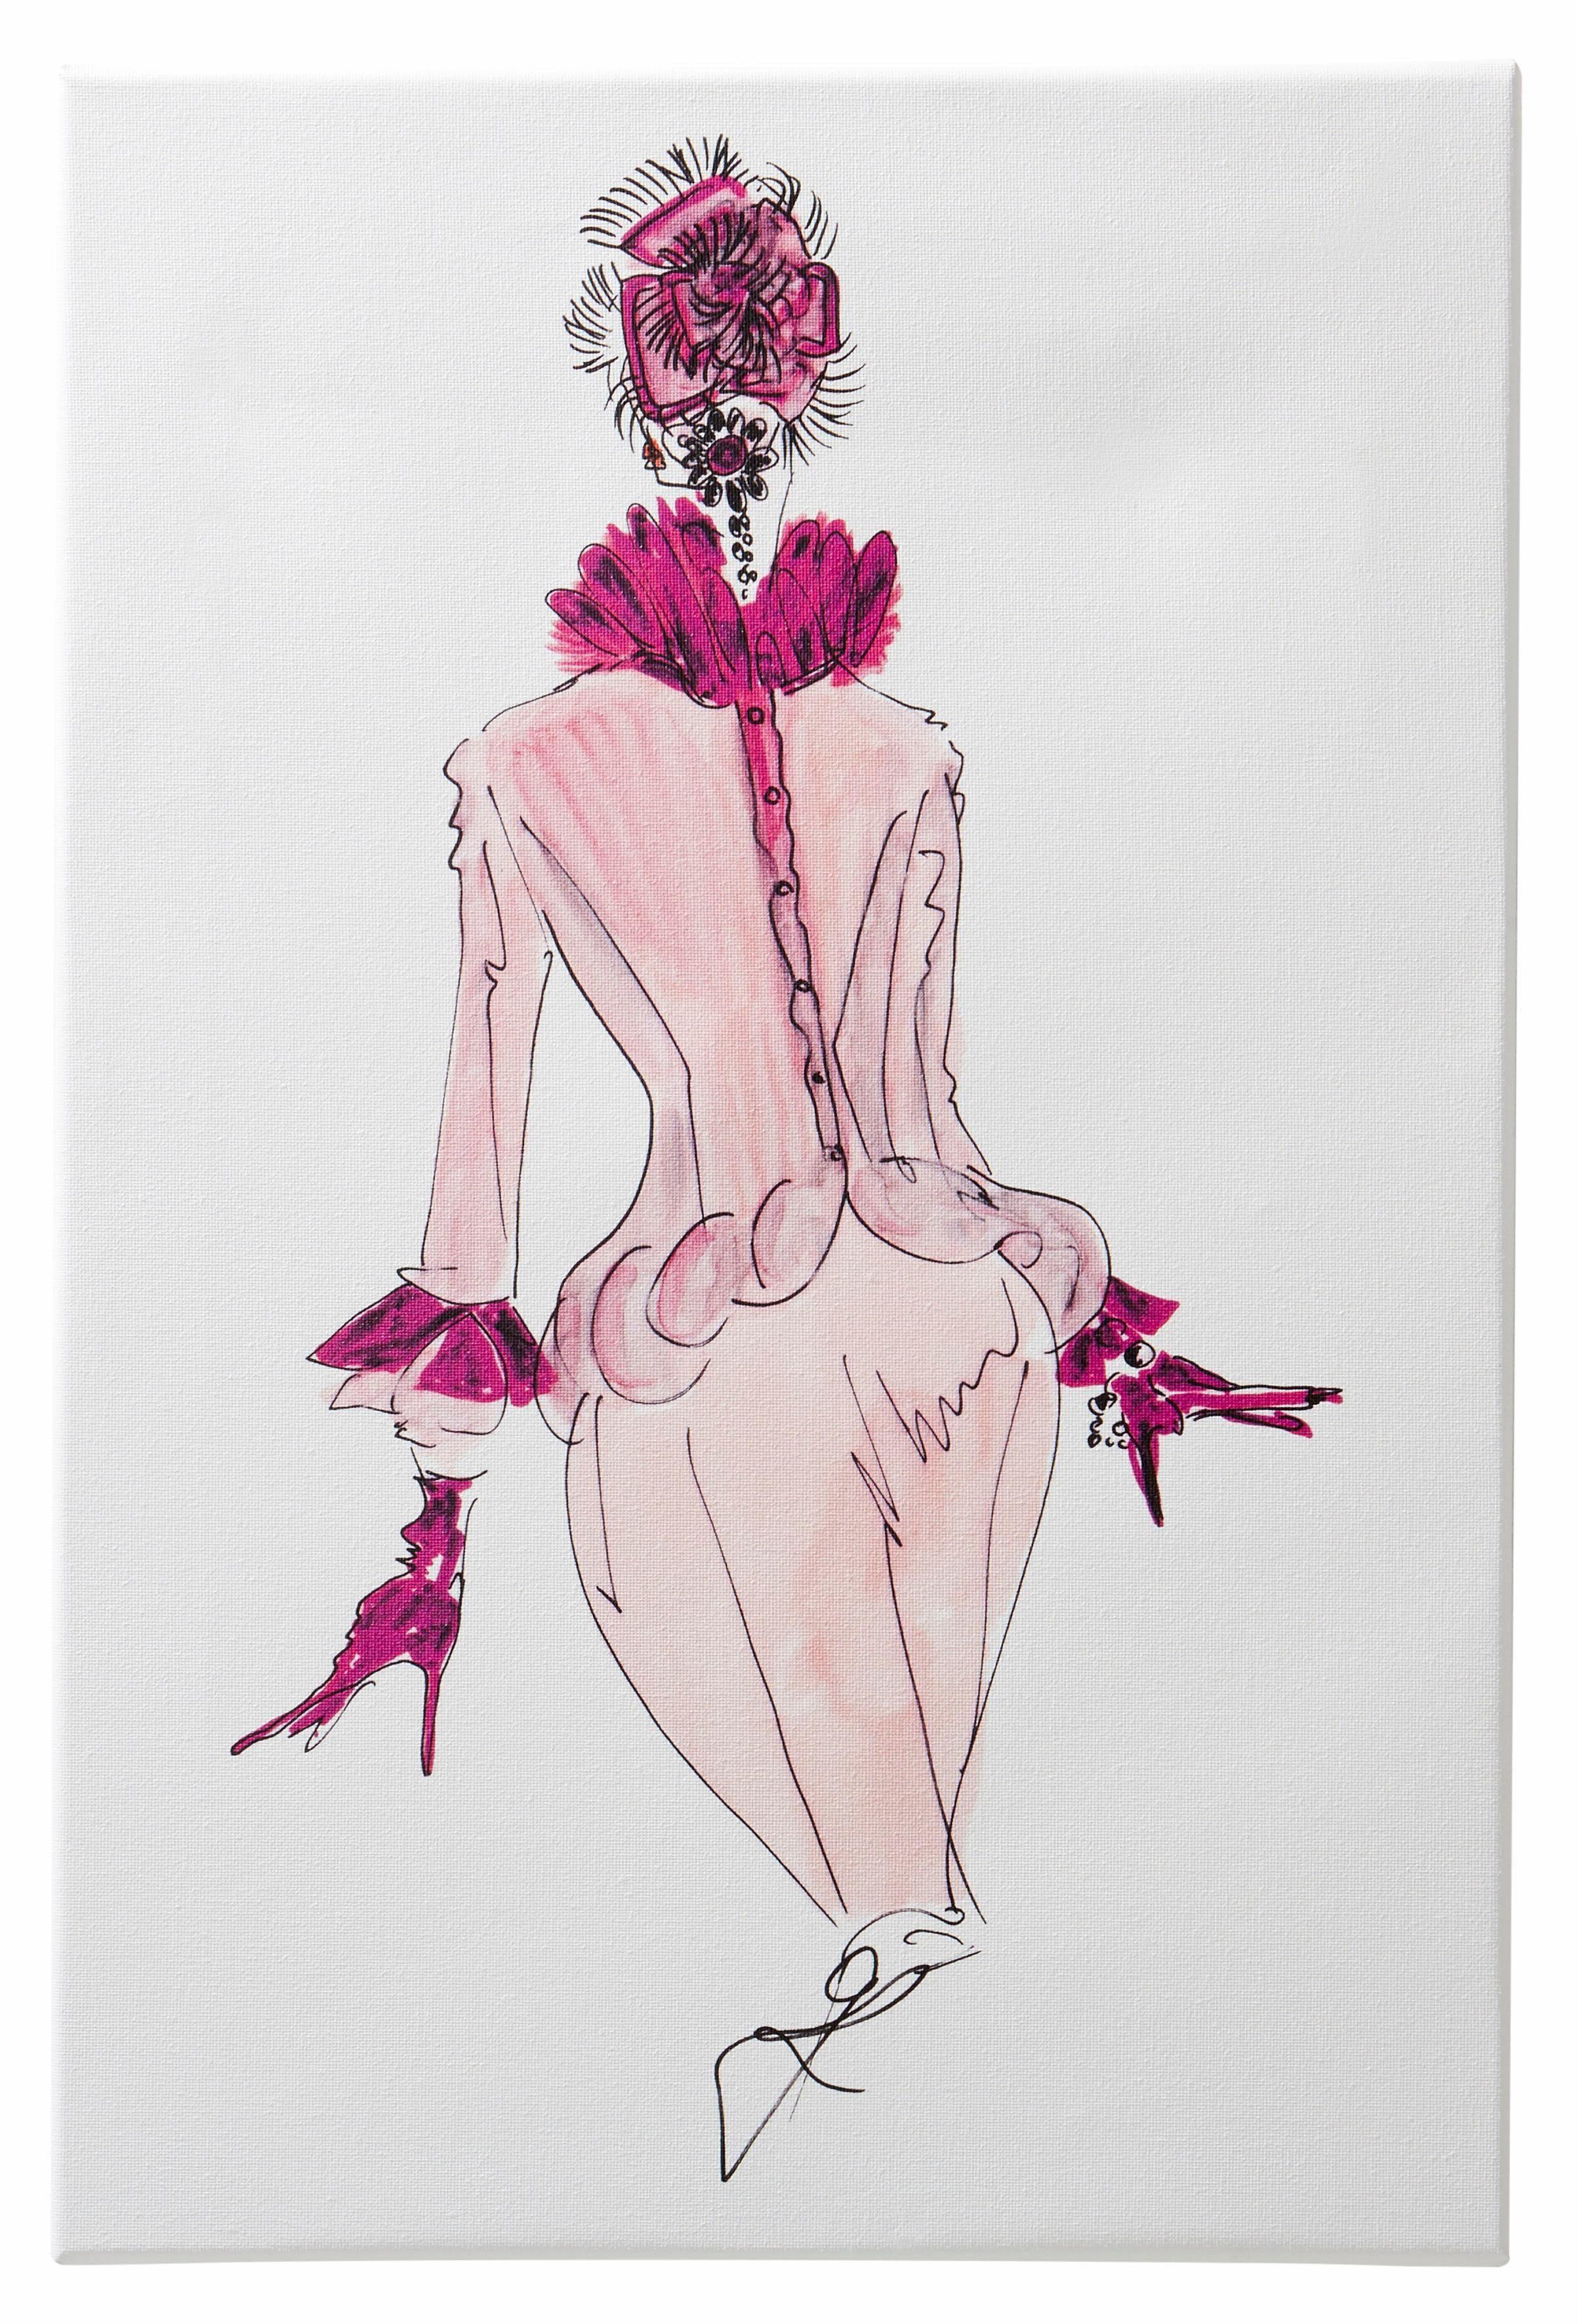 Guido Maria Kretschmer Home&Living Leinwandbild »Keilrahmenbild«, Mode, Zeichnung, 40/60 cm, gerahmt, Keilrahmen